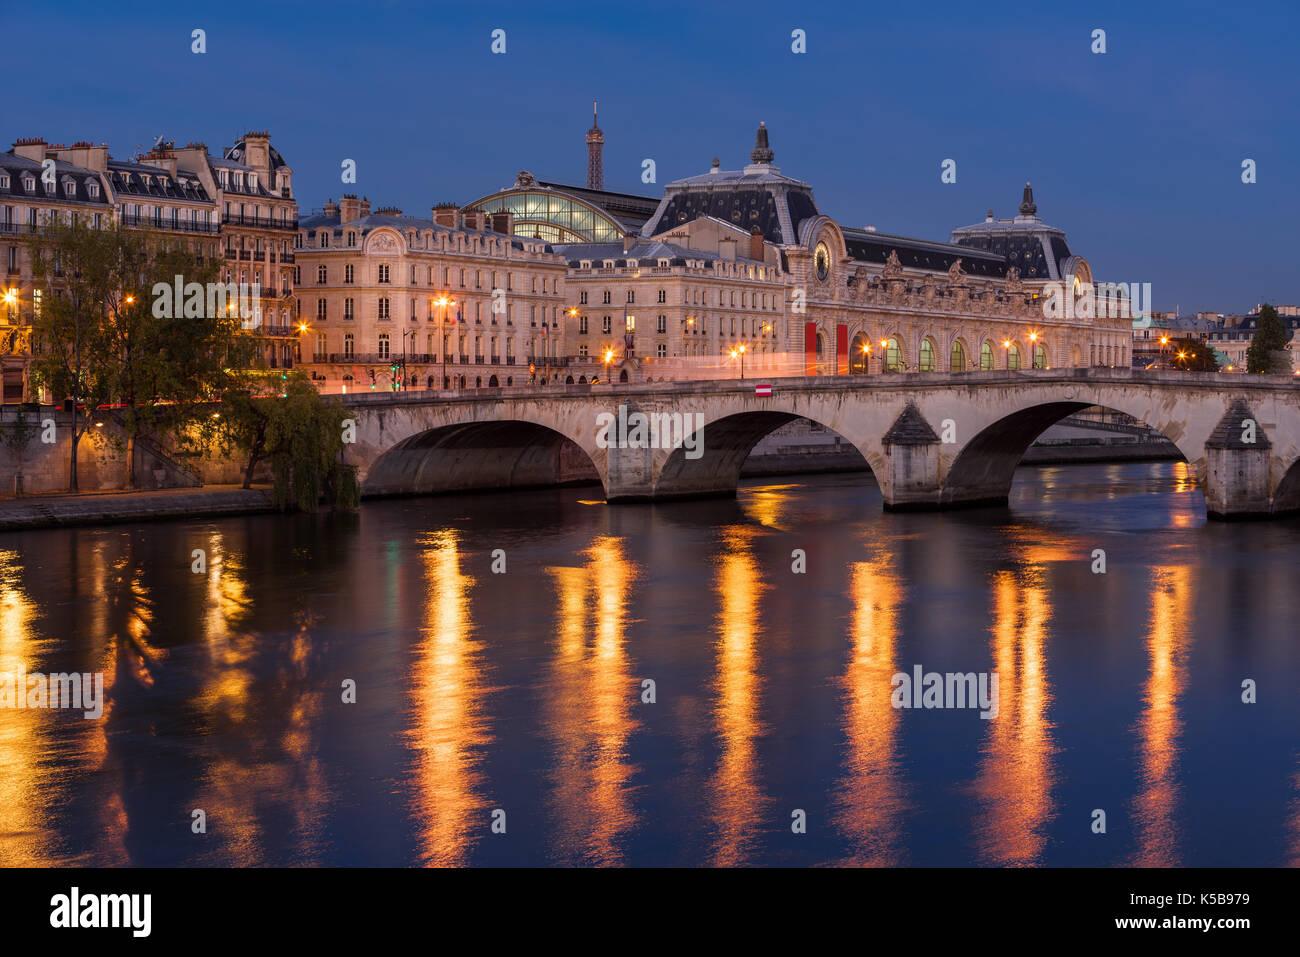 Seine River banks, Pont Royal bridge and Orsay Museum at daybreak. Paris, 7th Arrondissement, France - Stock Image